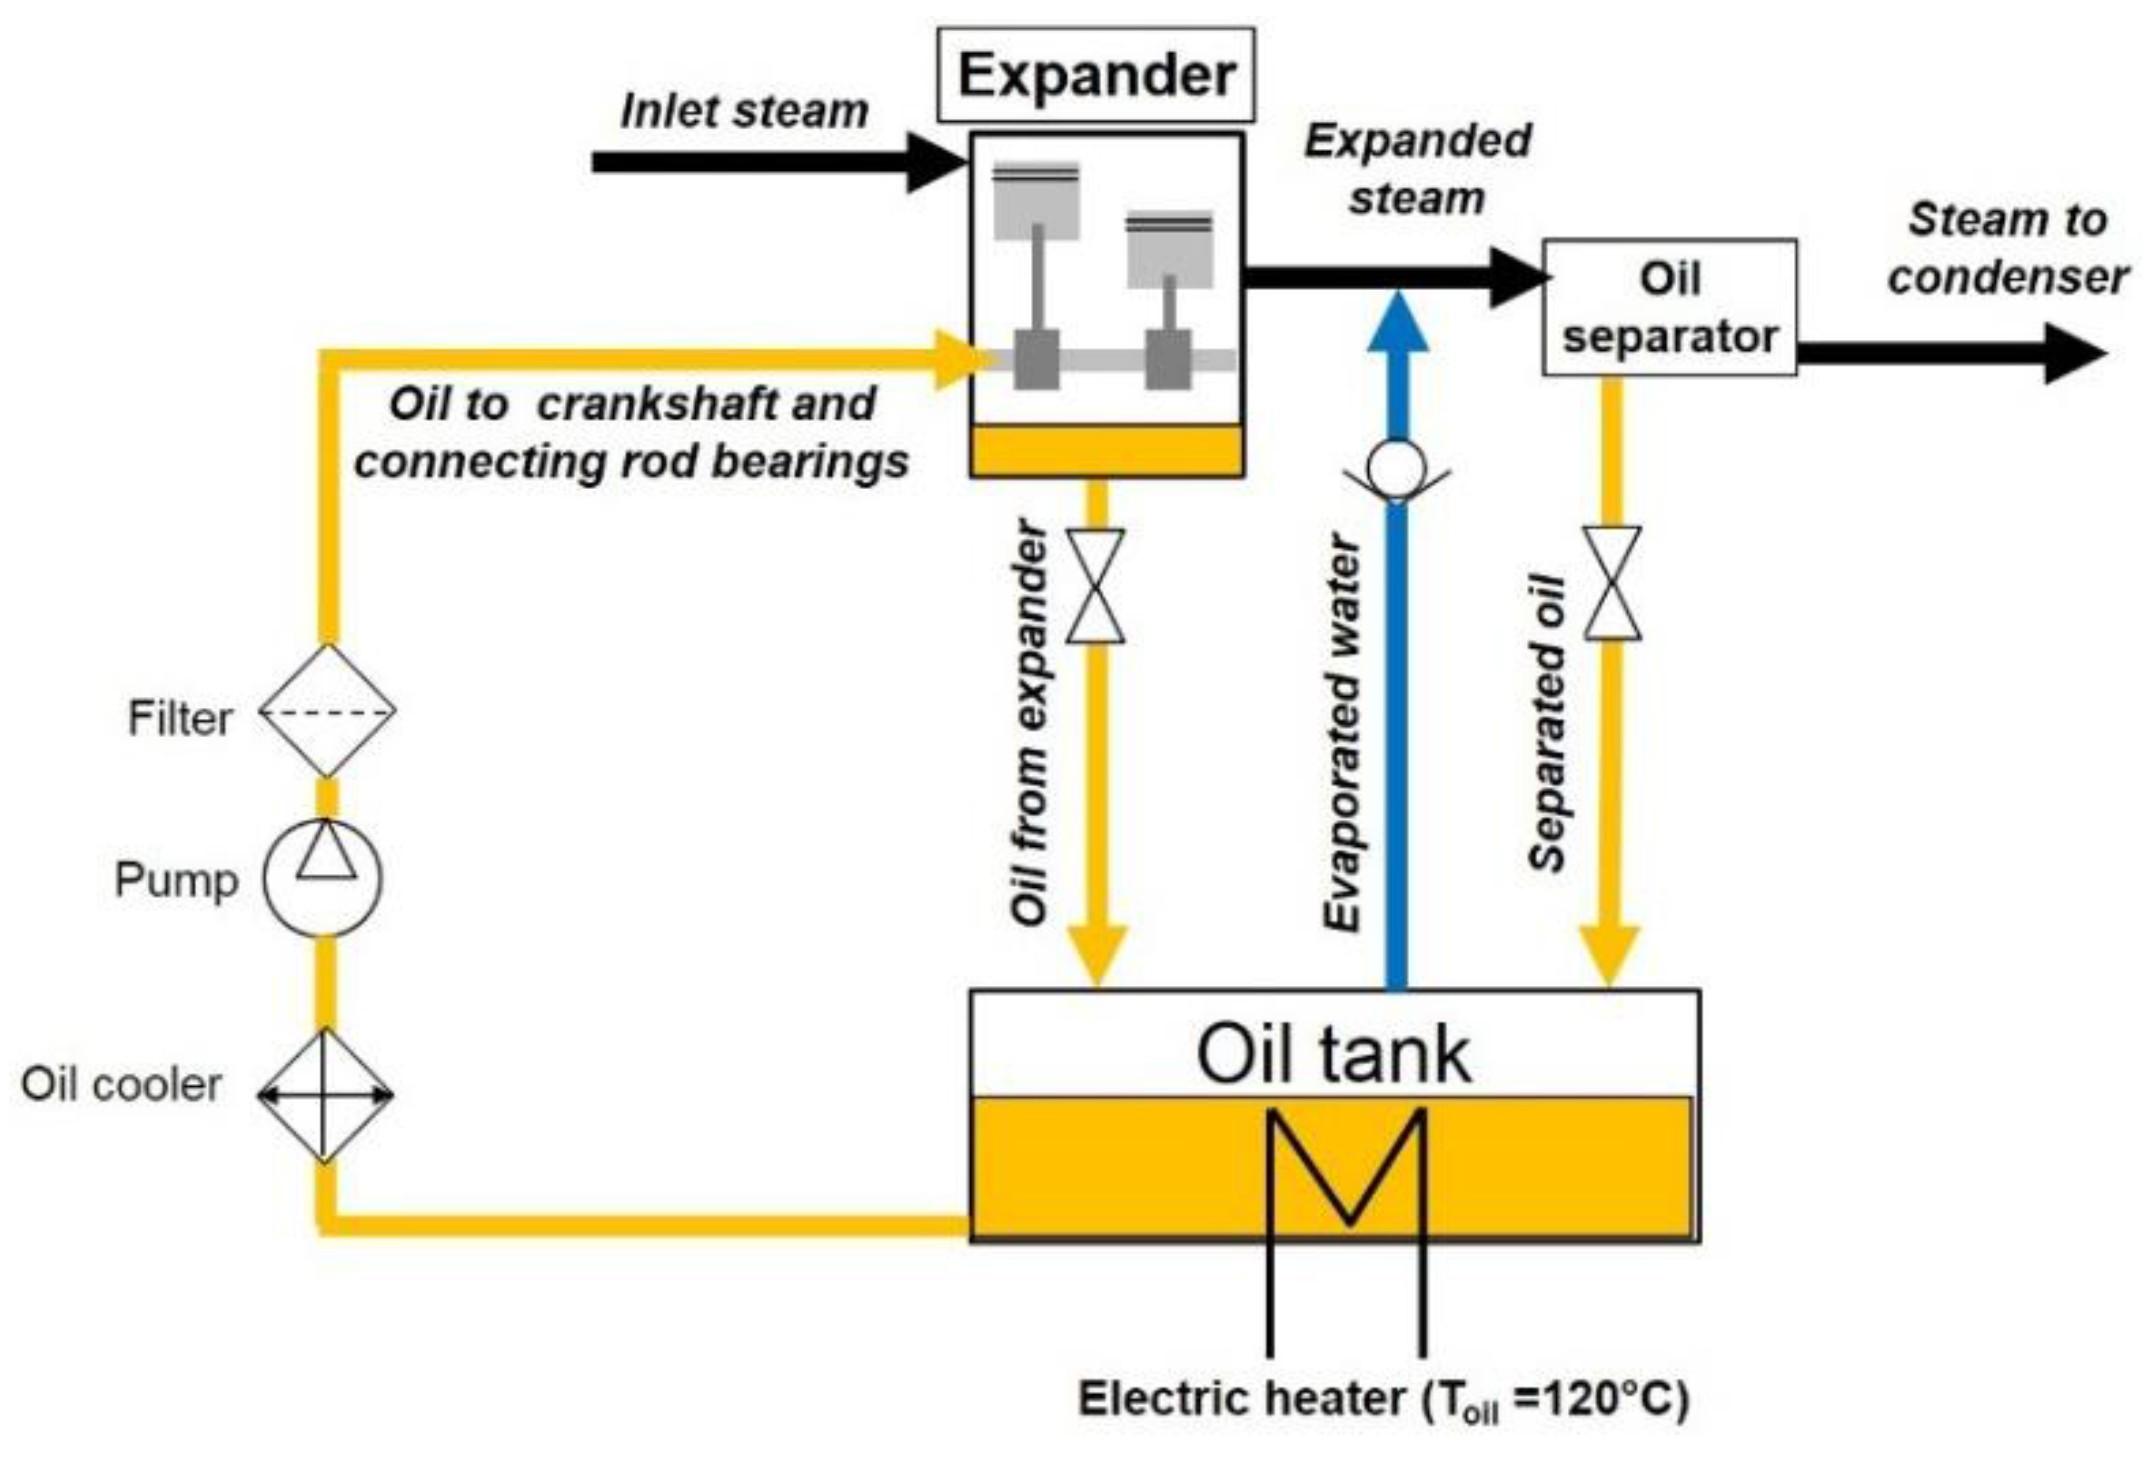 Engine Oiling Diagram Porsche 944 Oil Flow Transaxles Energies Free Full Text Of